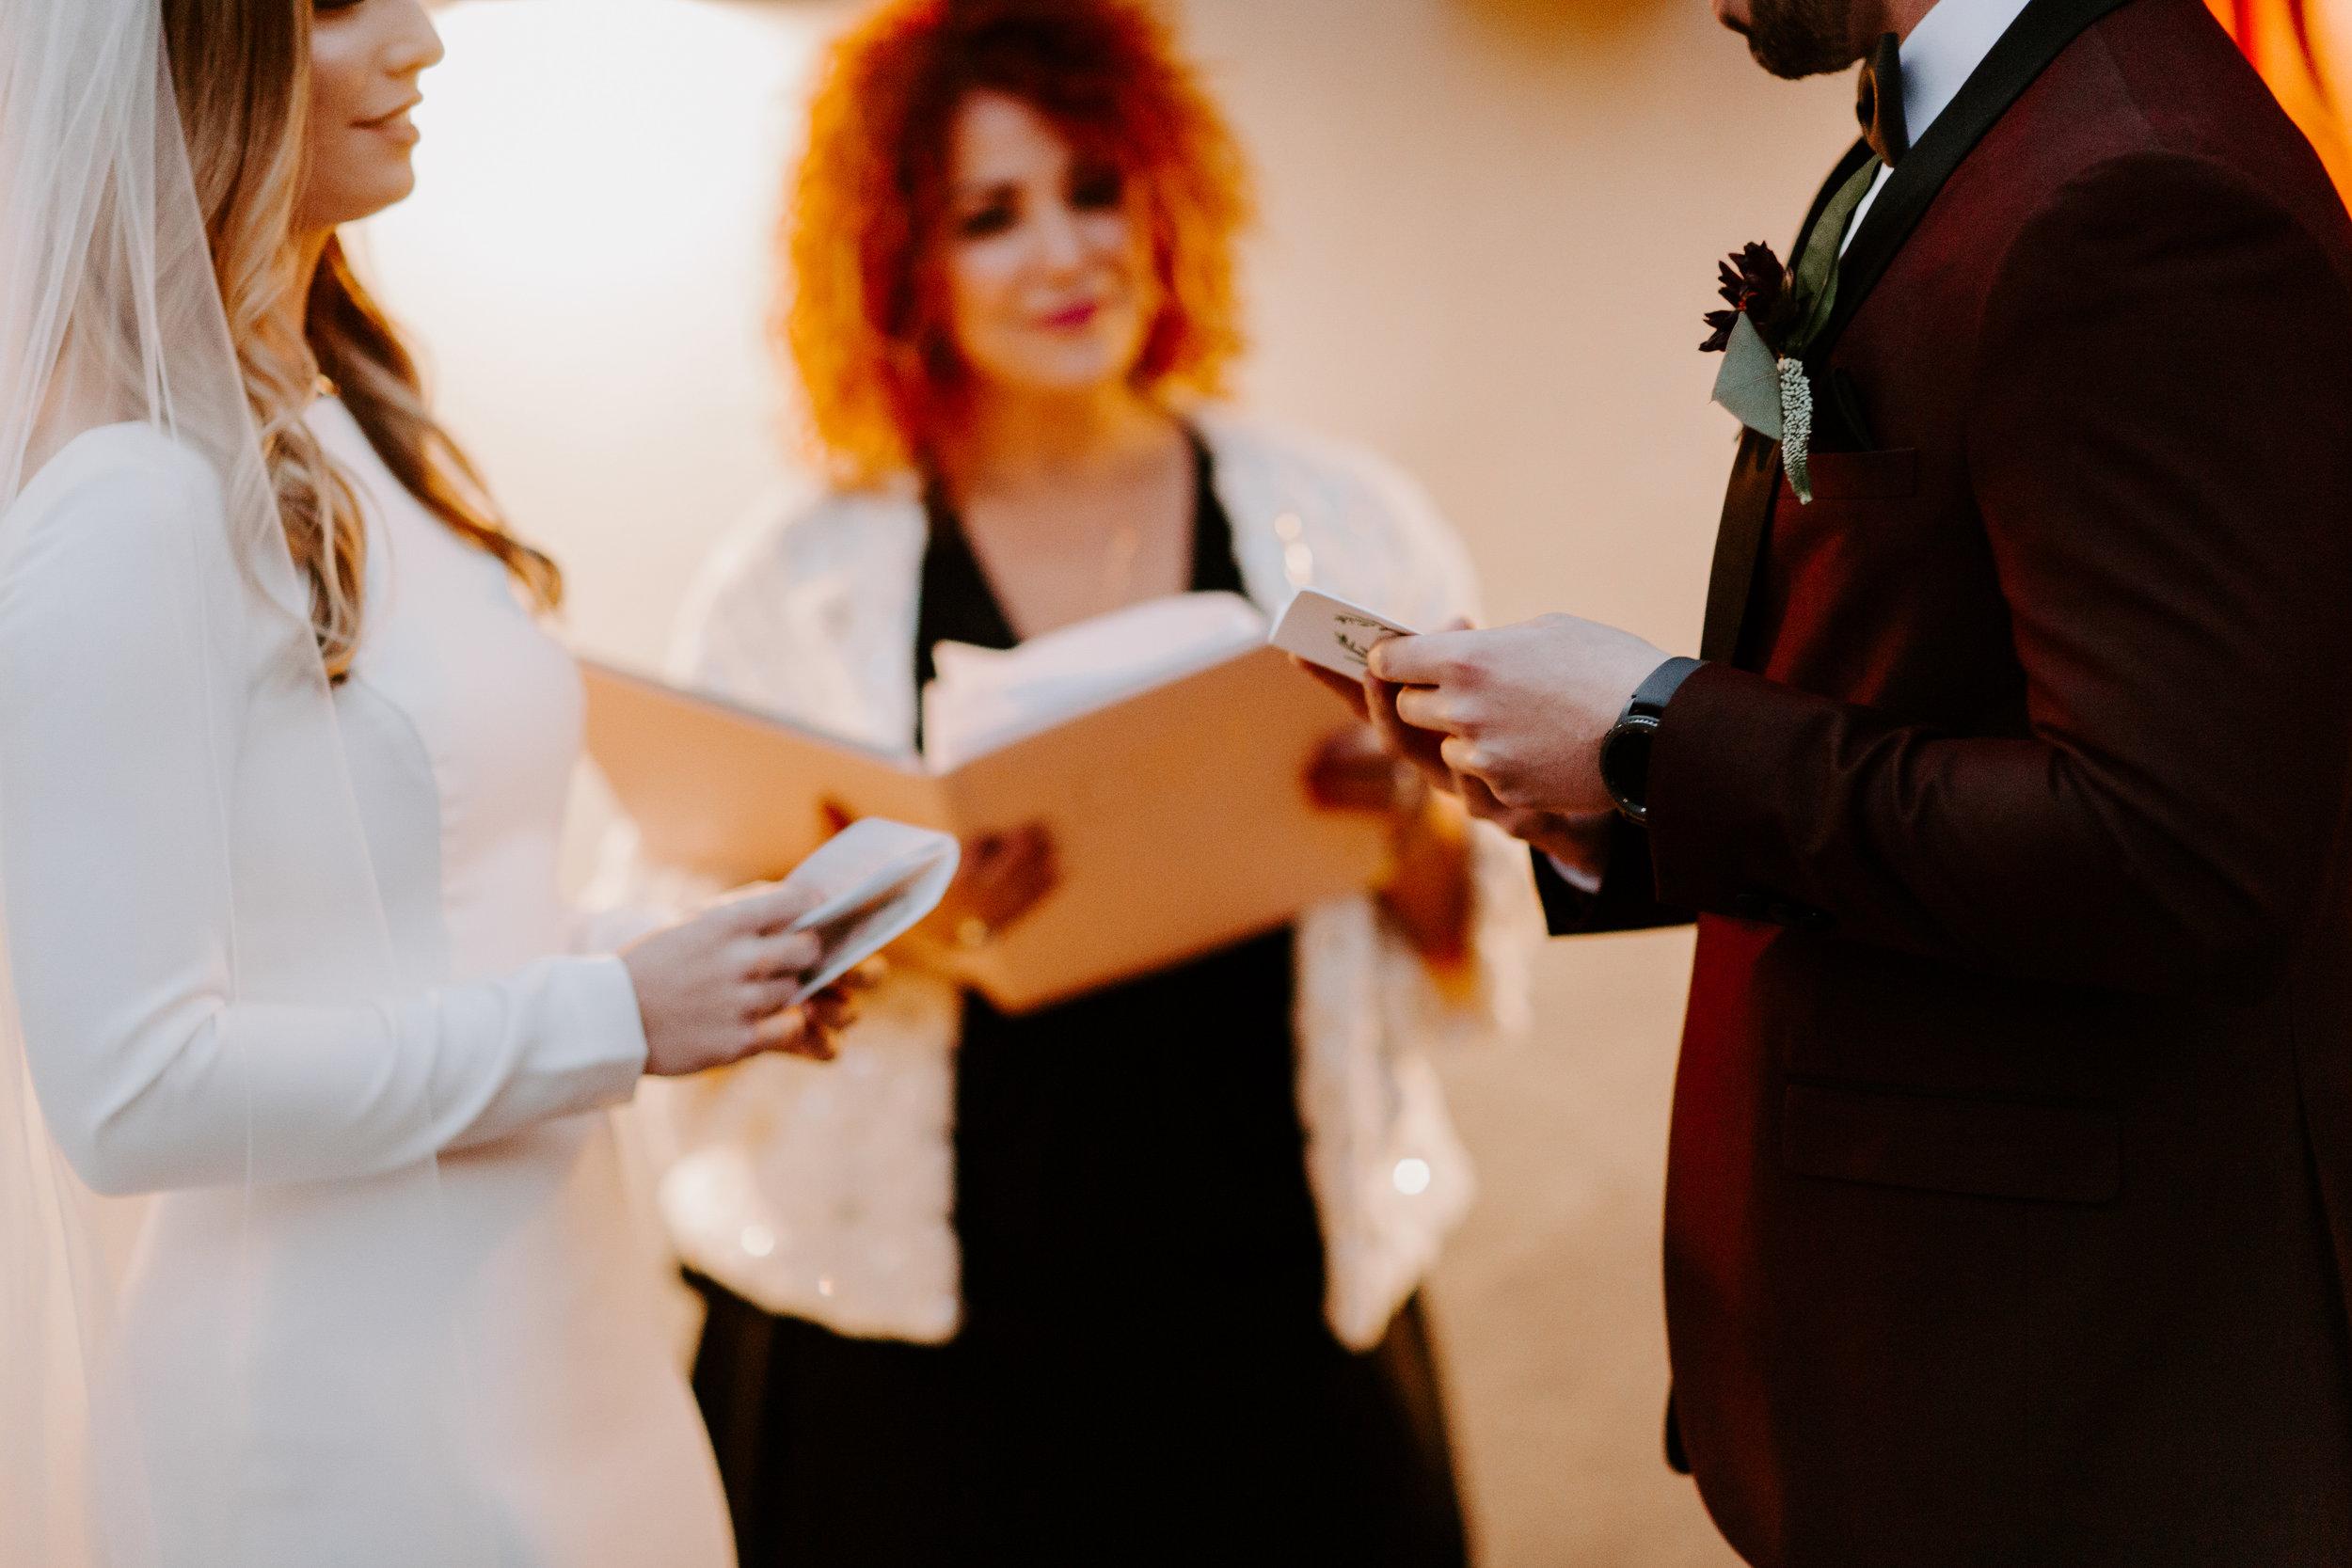 Catahoula Hotel Rooftop Wedding Ceremony New Orleans Wedding Photographer Ashley Biltz Photography43.jpg